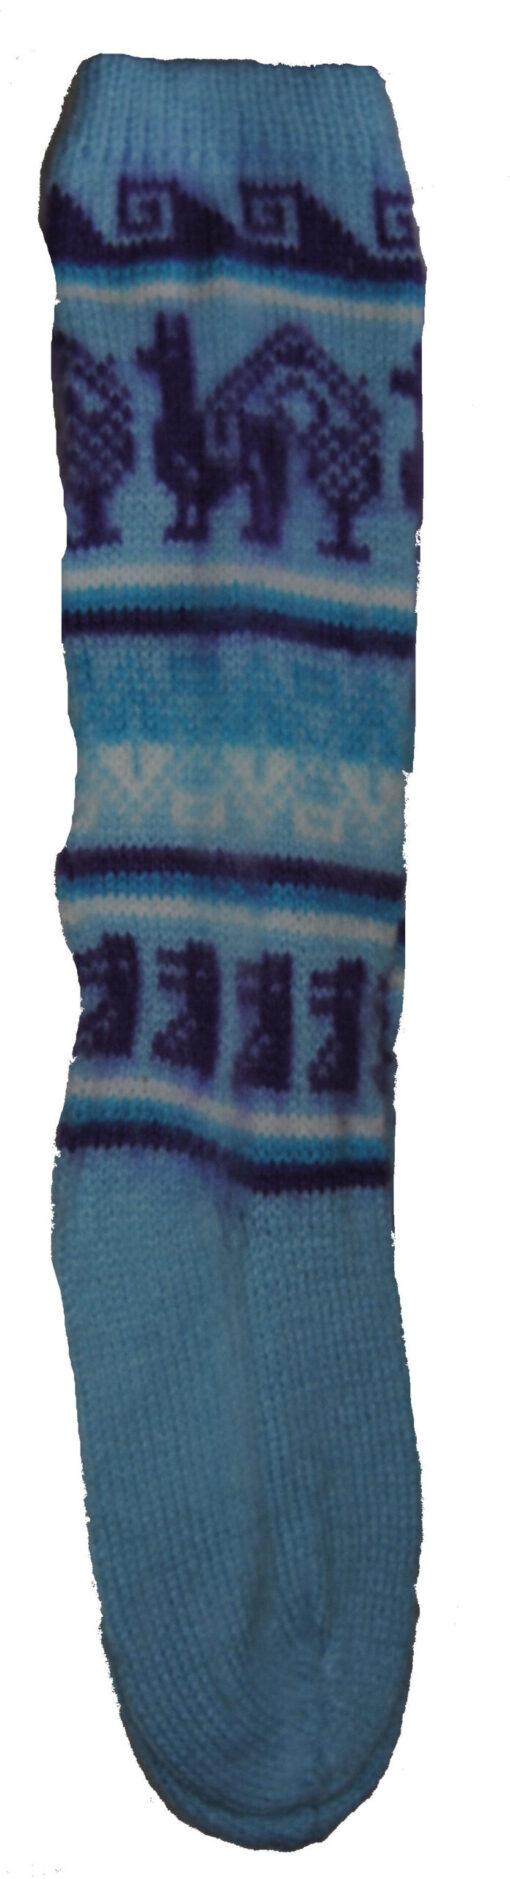 alpaca wool socks